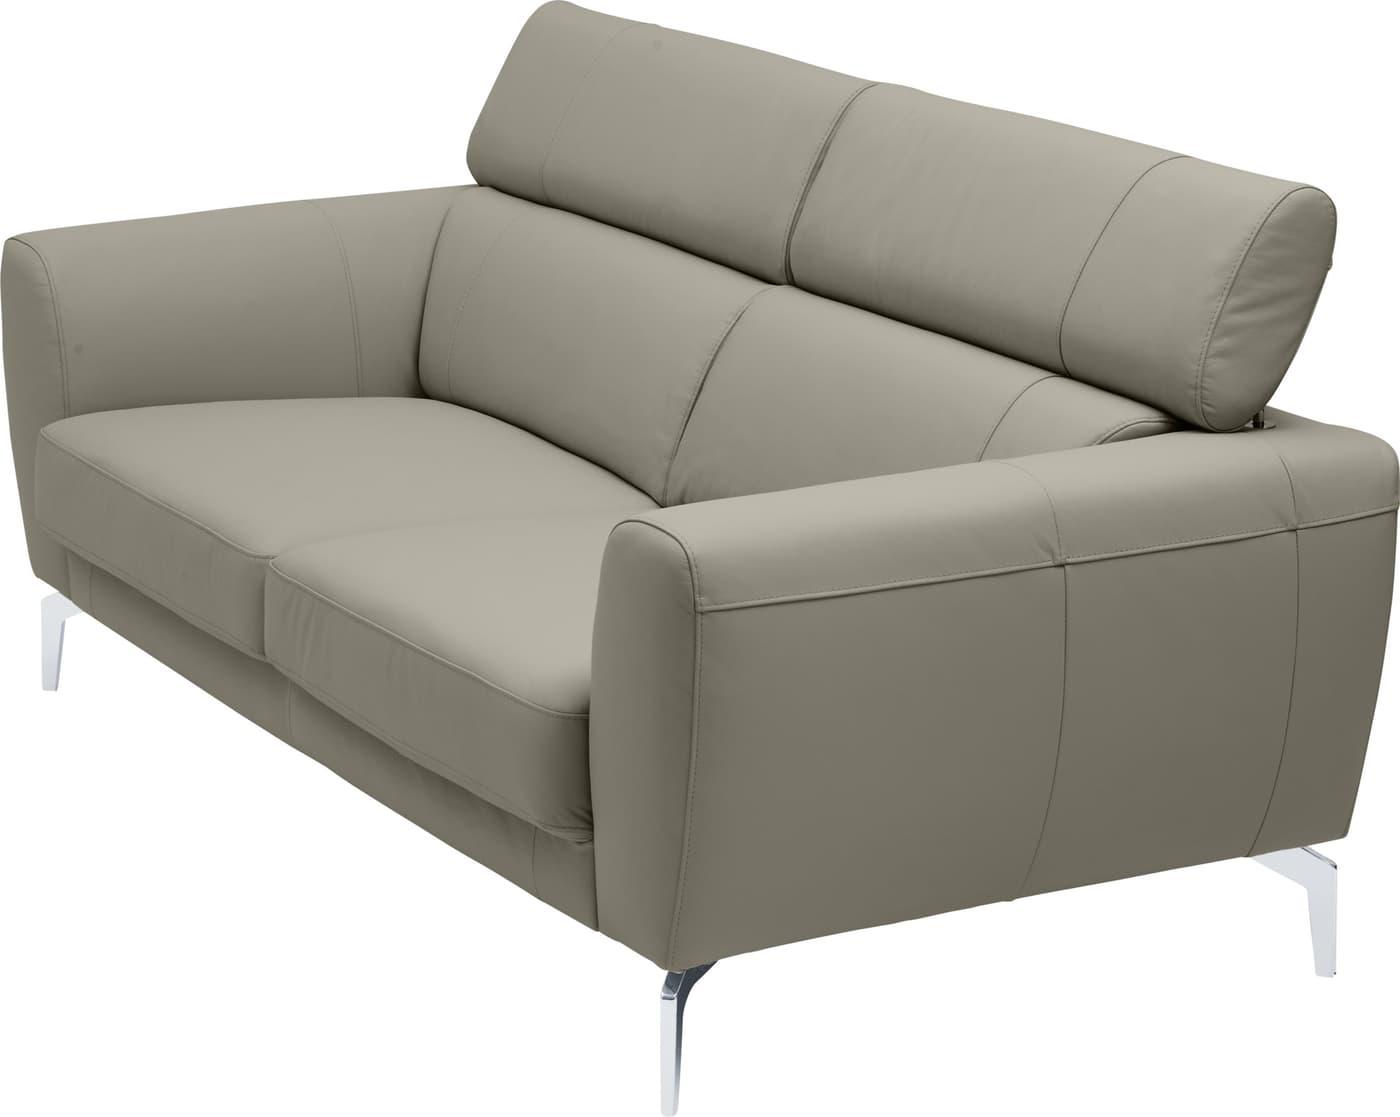 Sofa schilling simple fat with sofa schilling elegant deutsch beautiful ersofa schilling with sofa schilling parisarafo Images